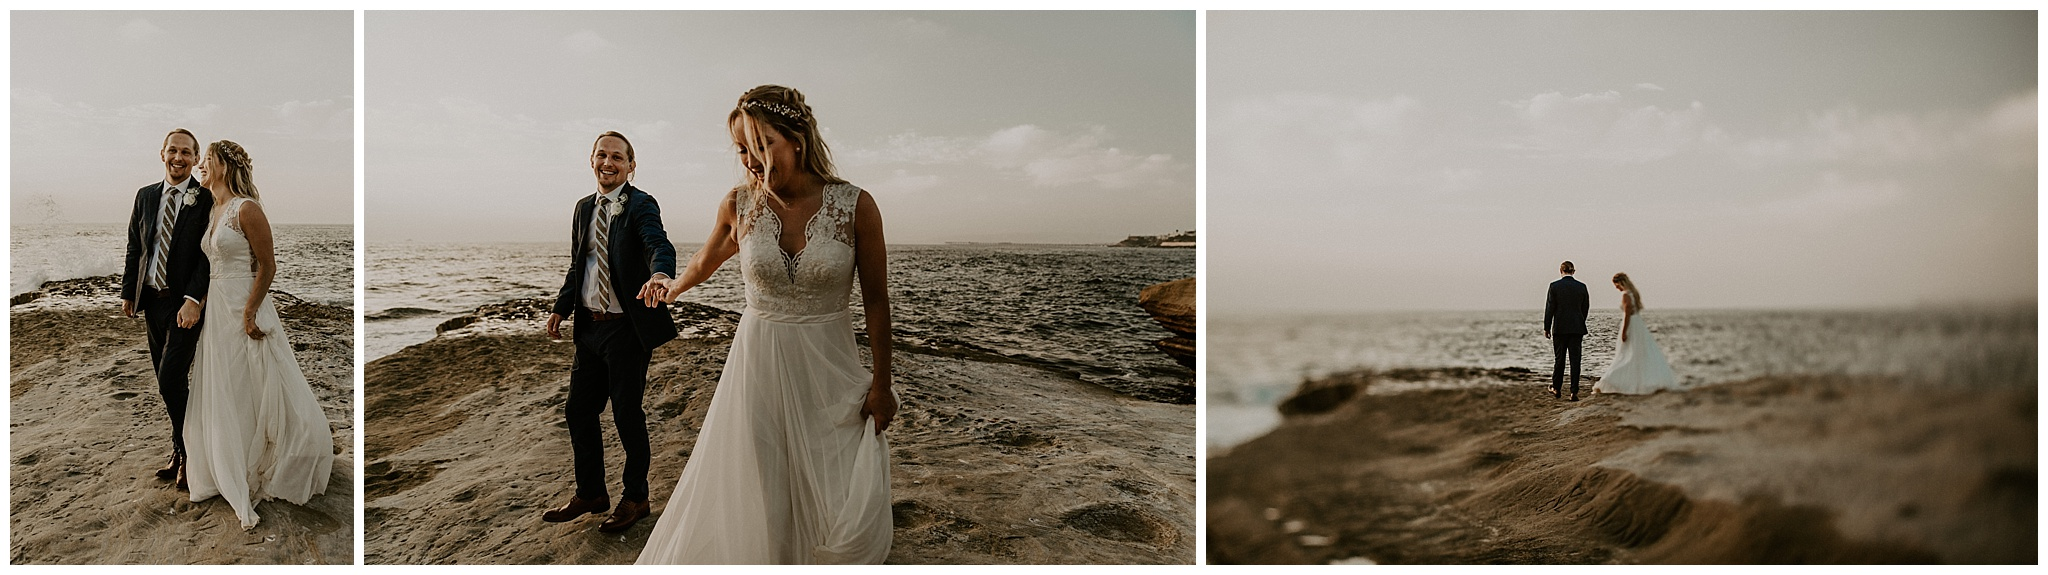 kauai-wedding-photographer5.jpg